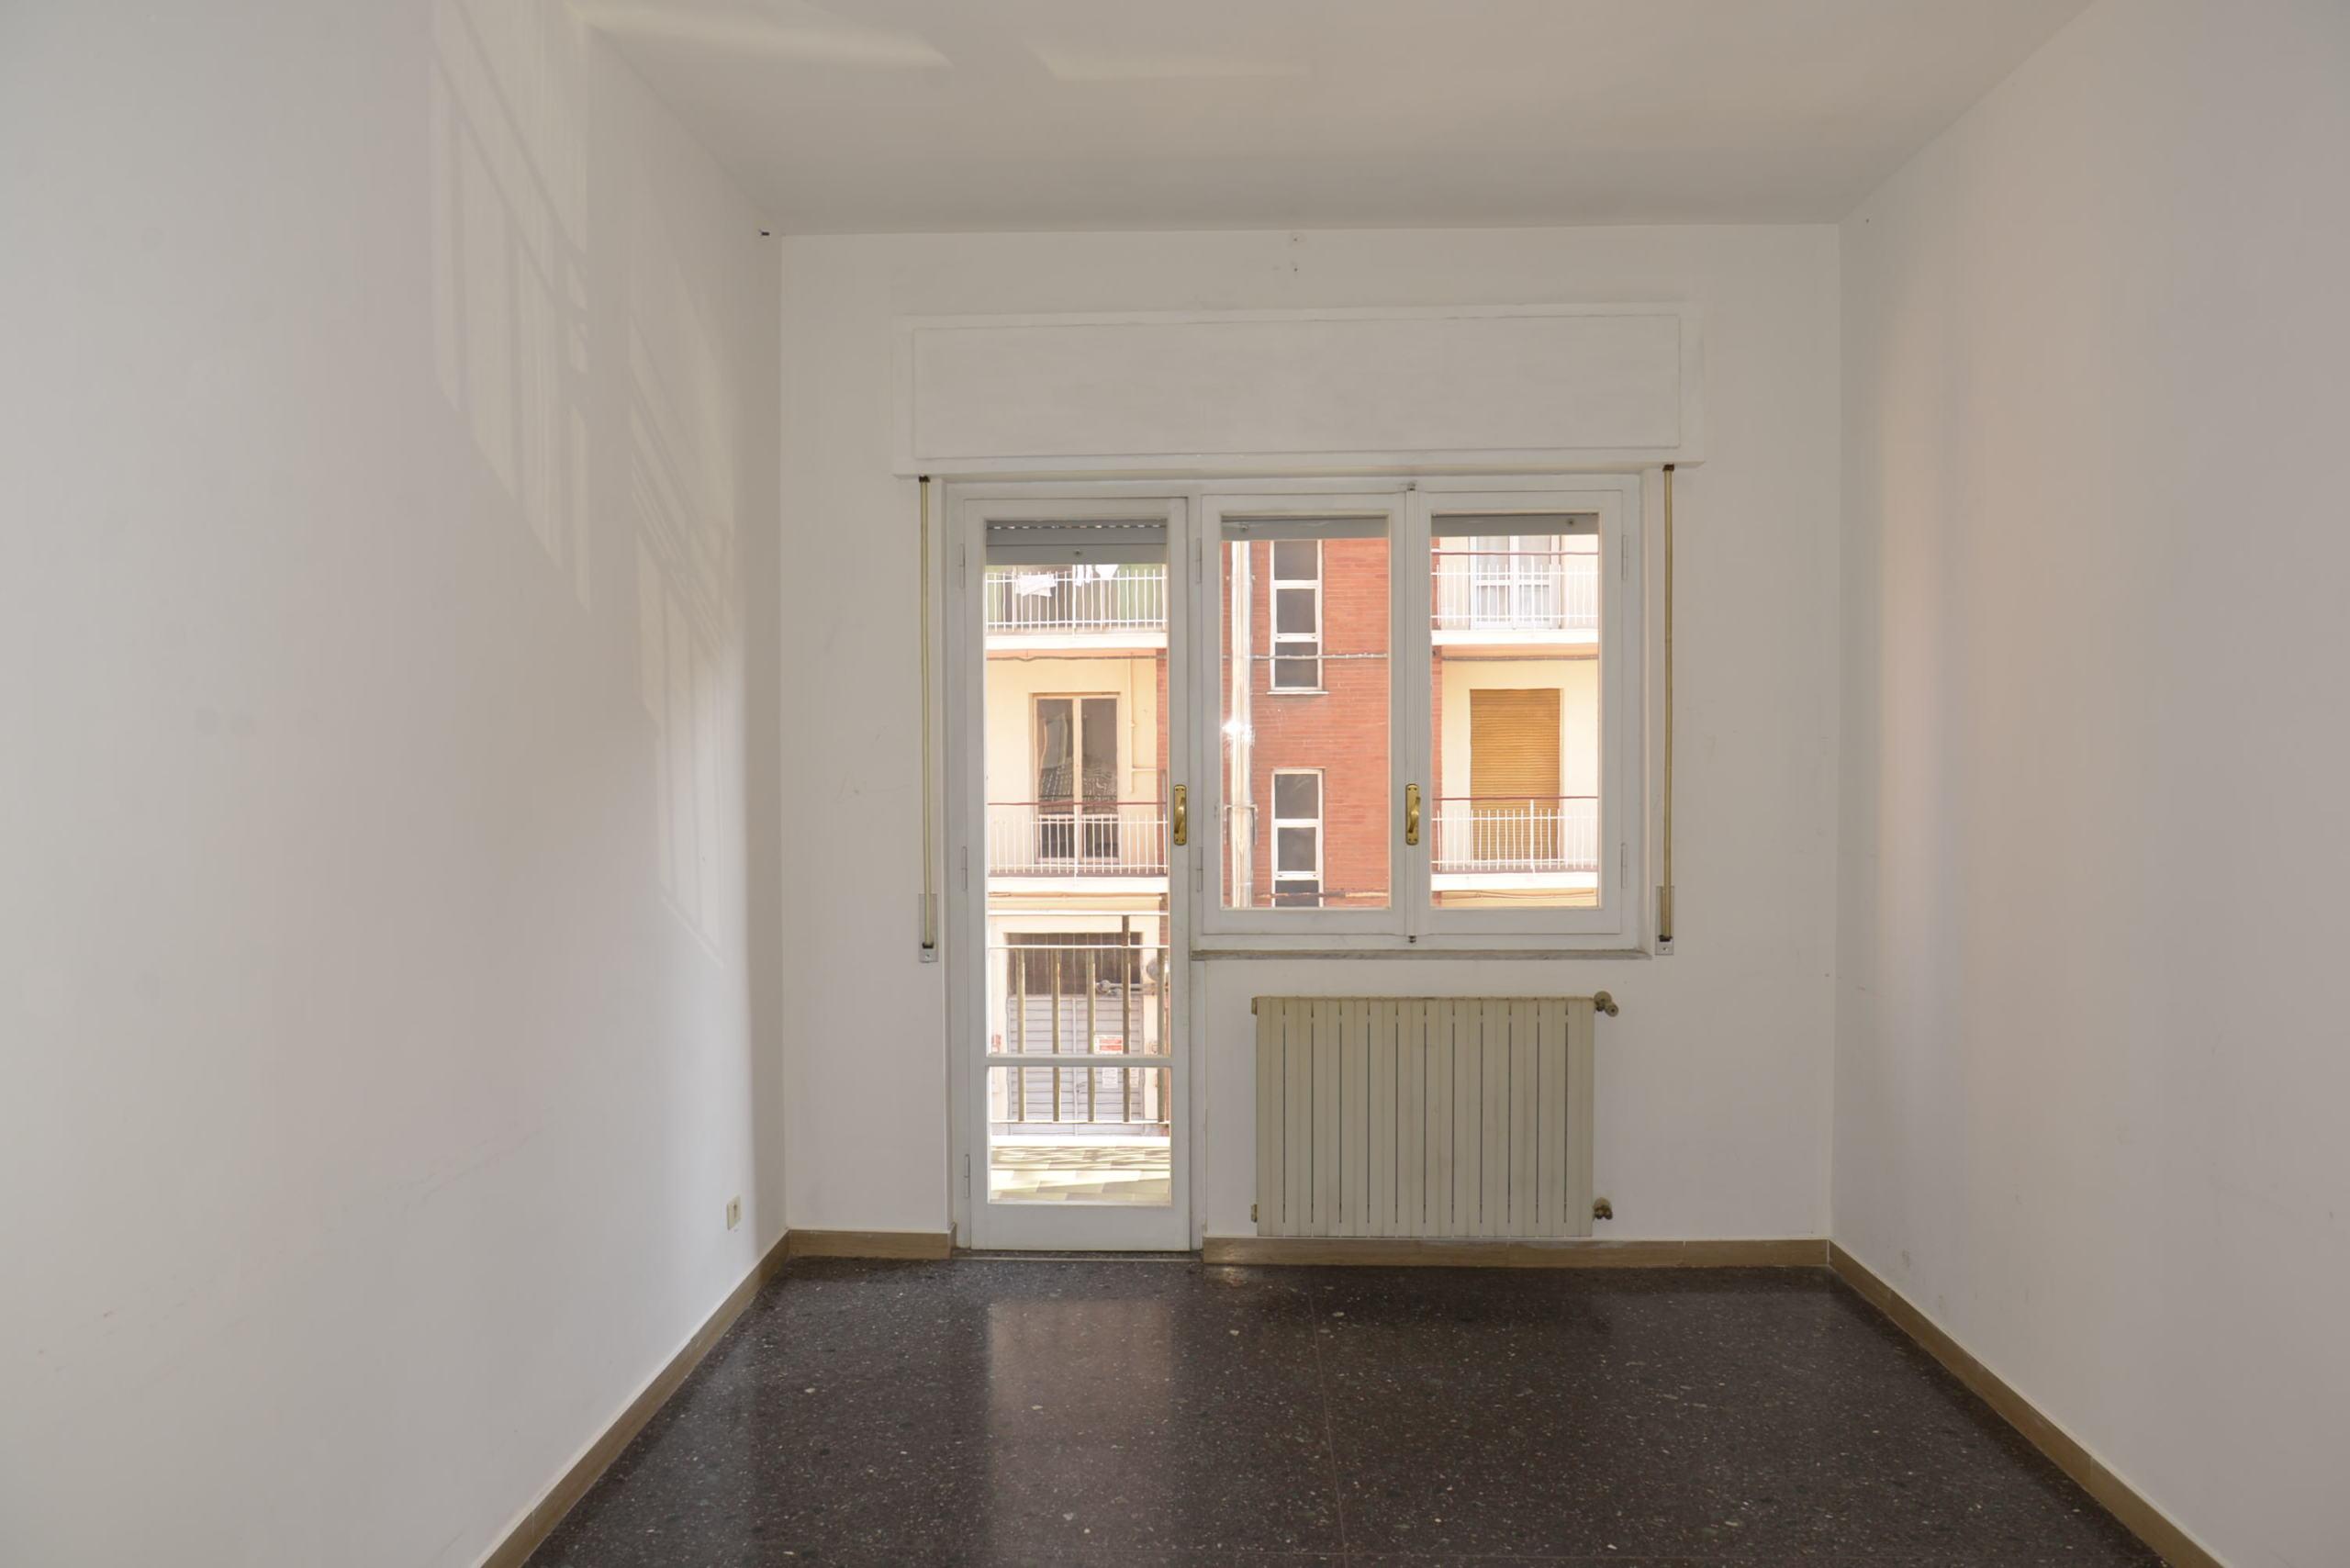 Appartamento - Porto Vado, Vado Ligure